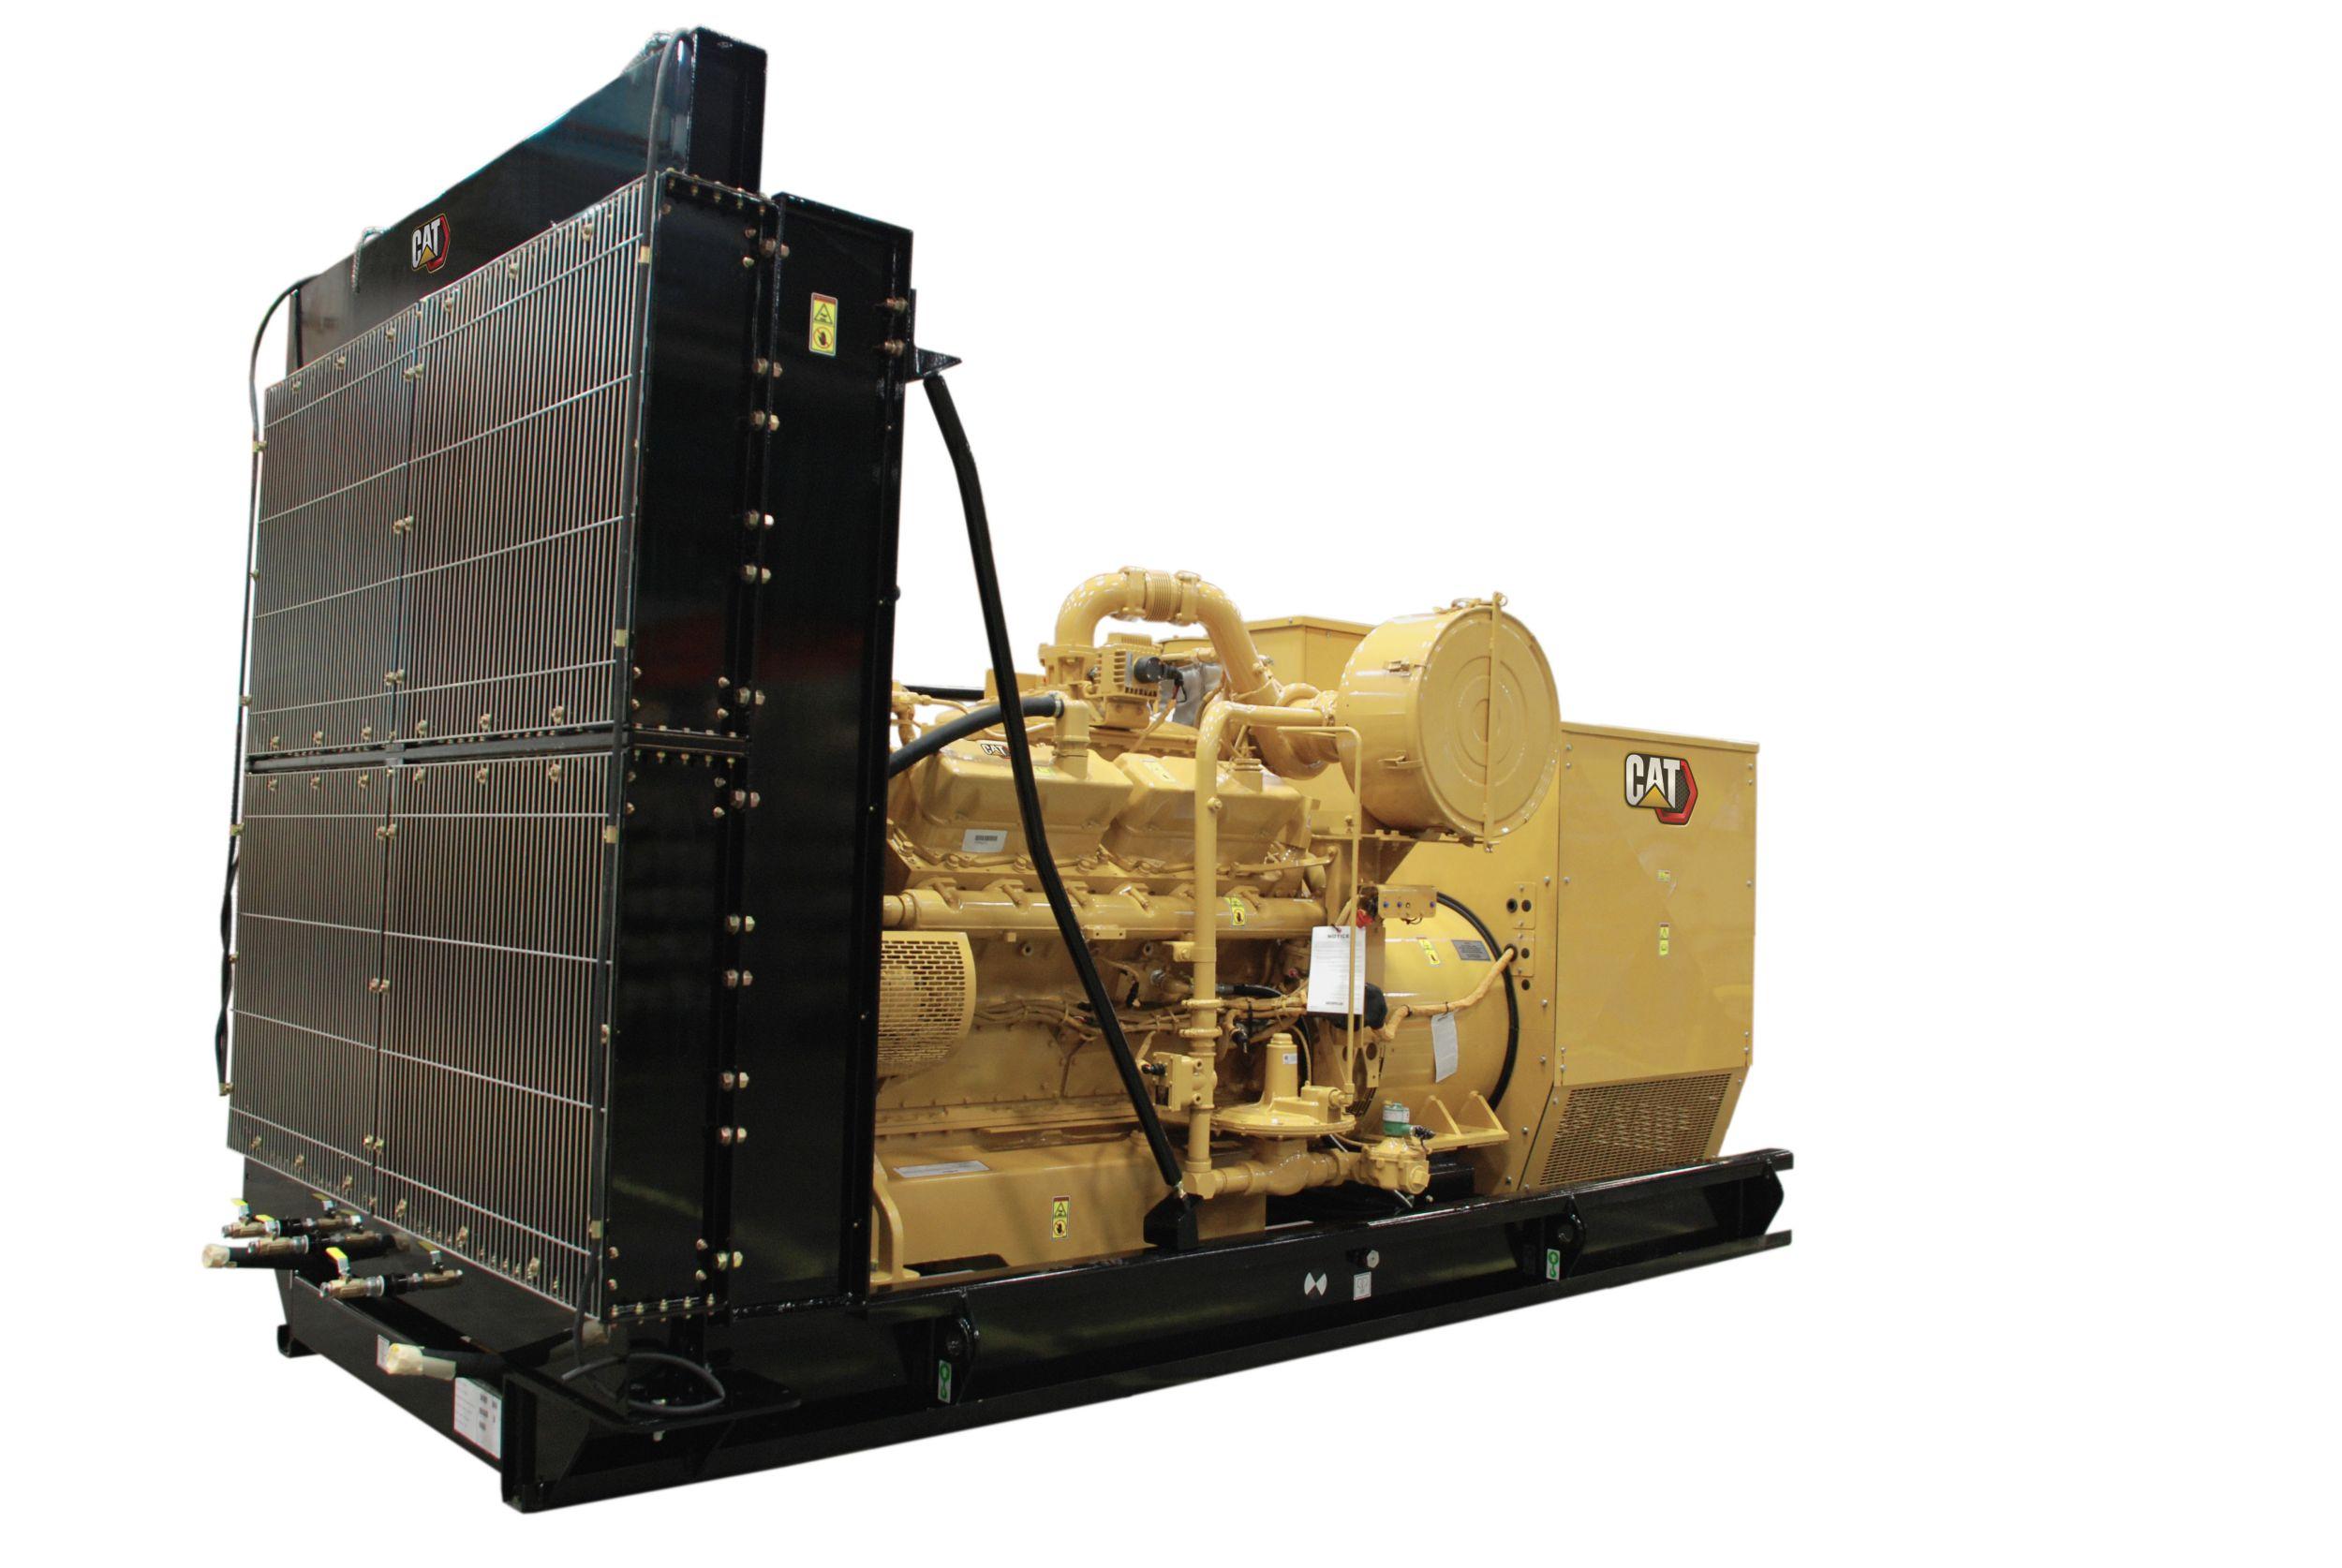 Cat | G3412 Gas Generator Set | Caterpillar